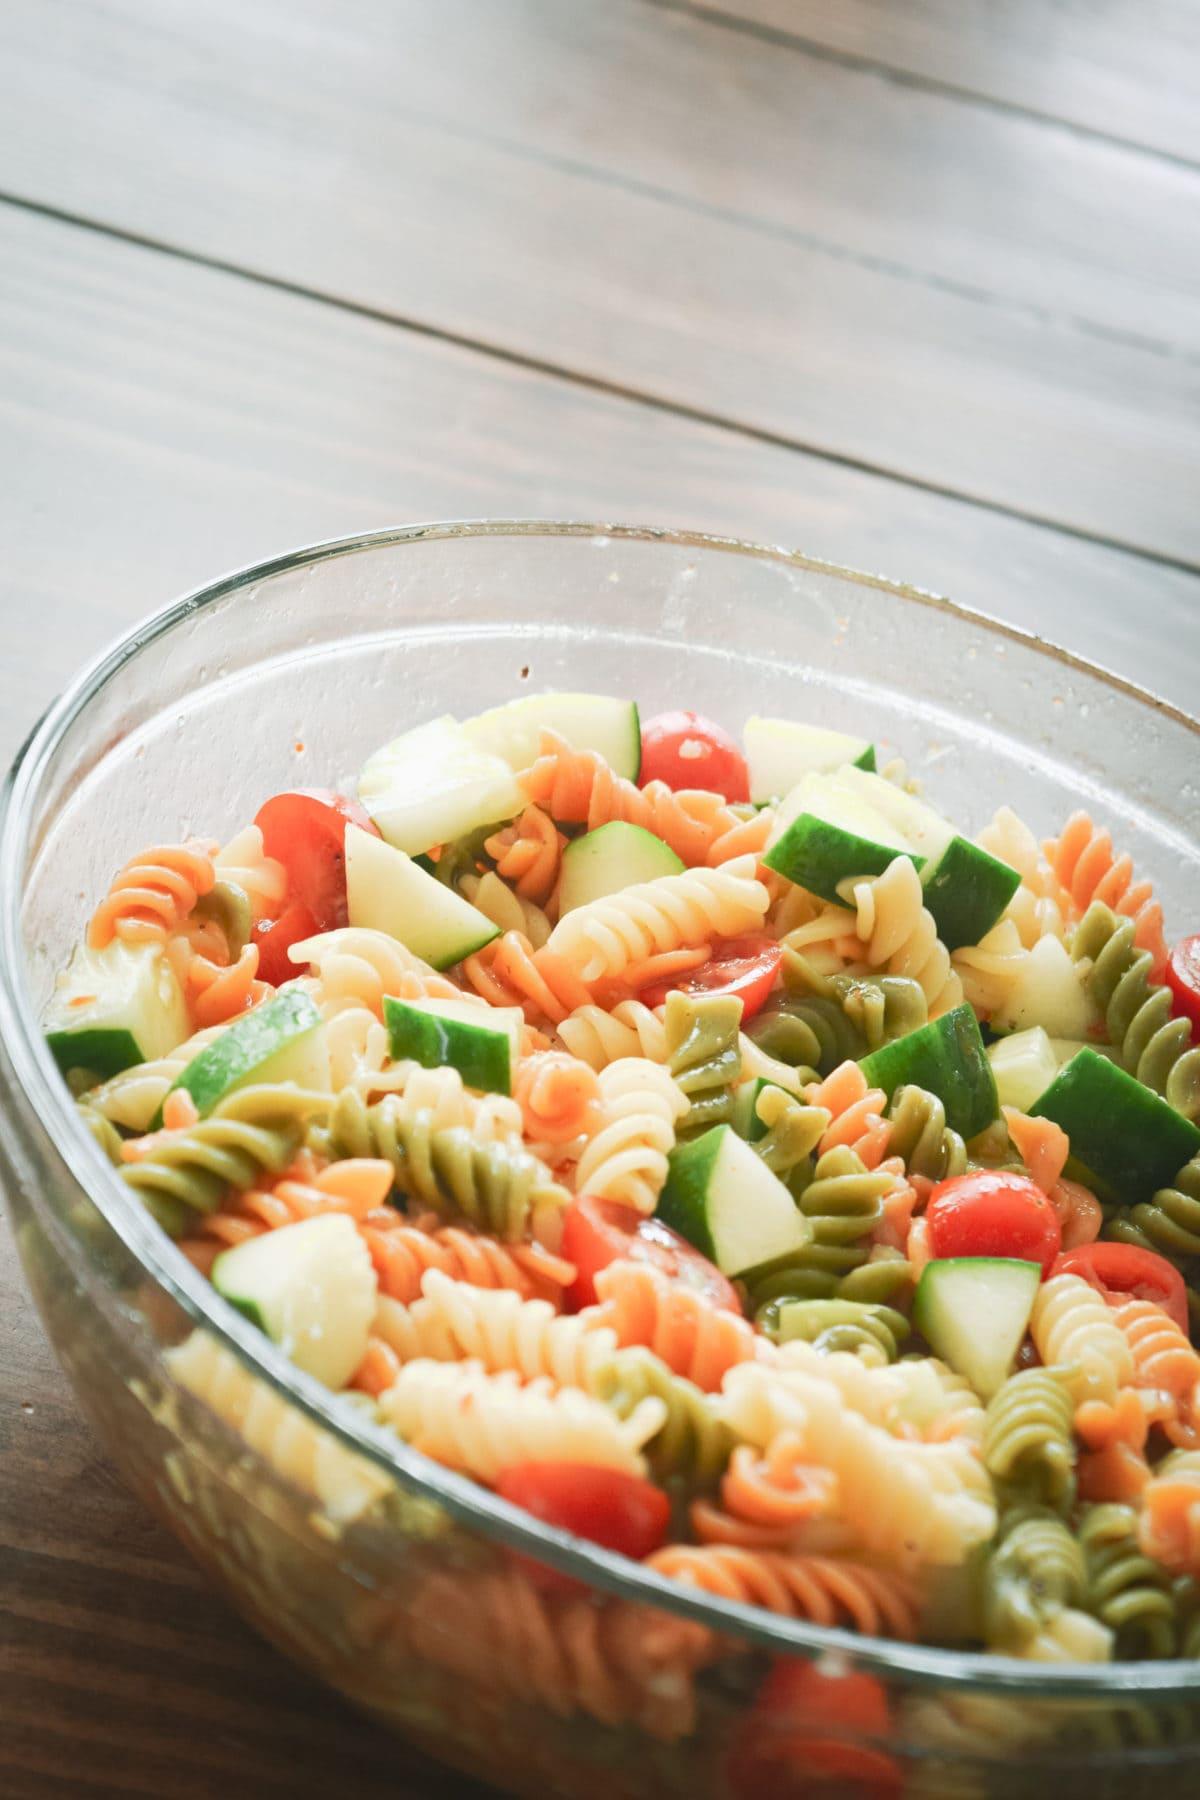 World's Easiest Pasta Salad